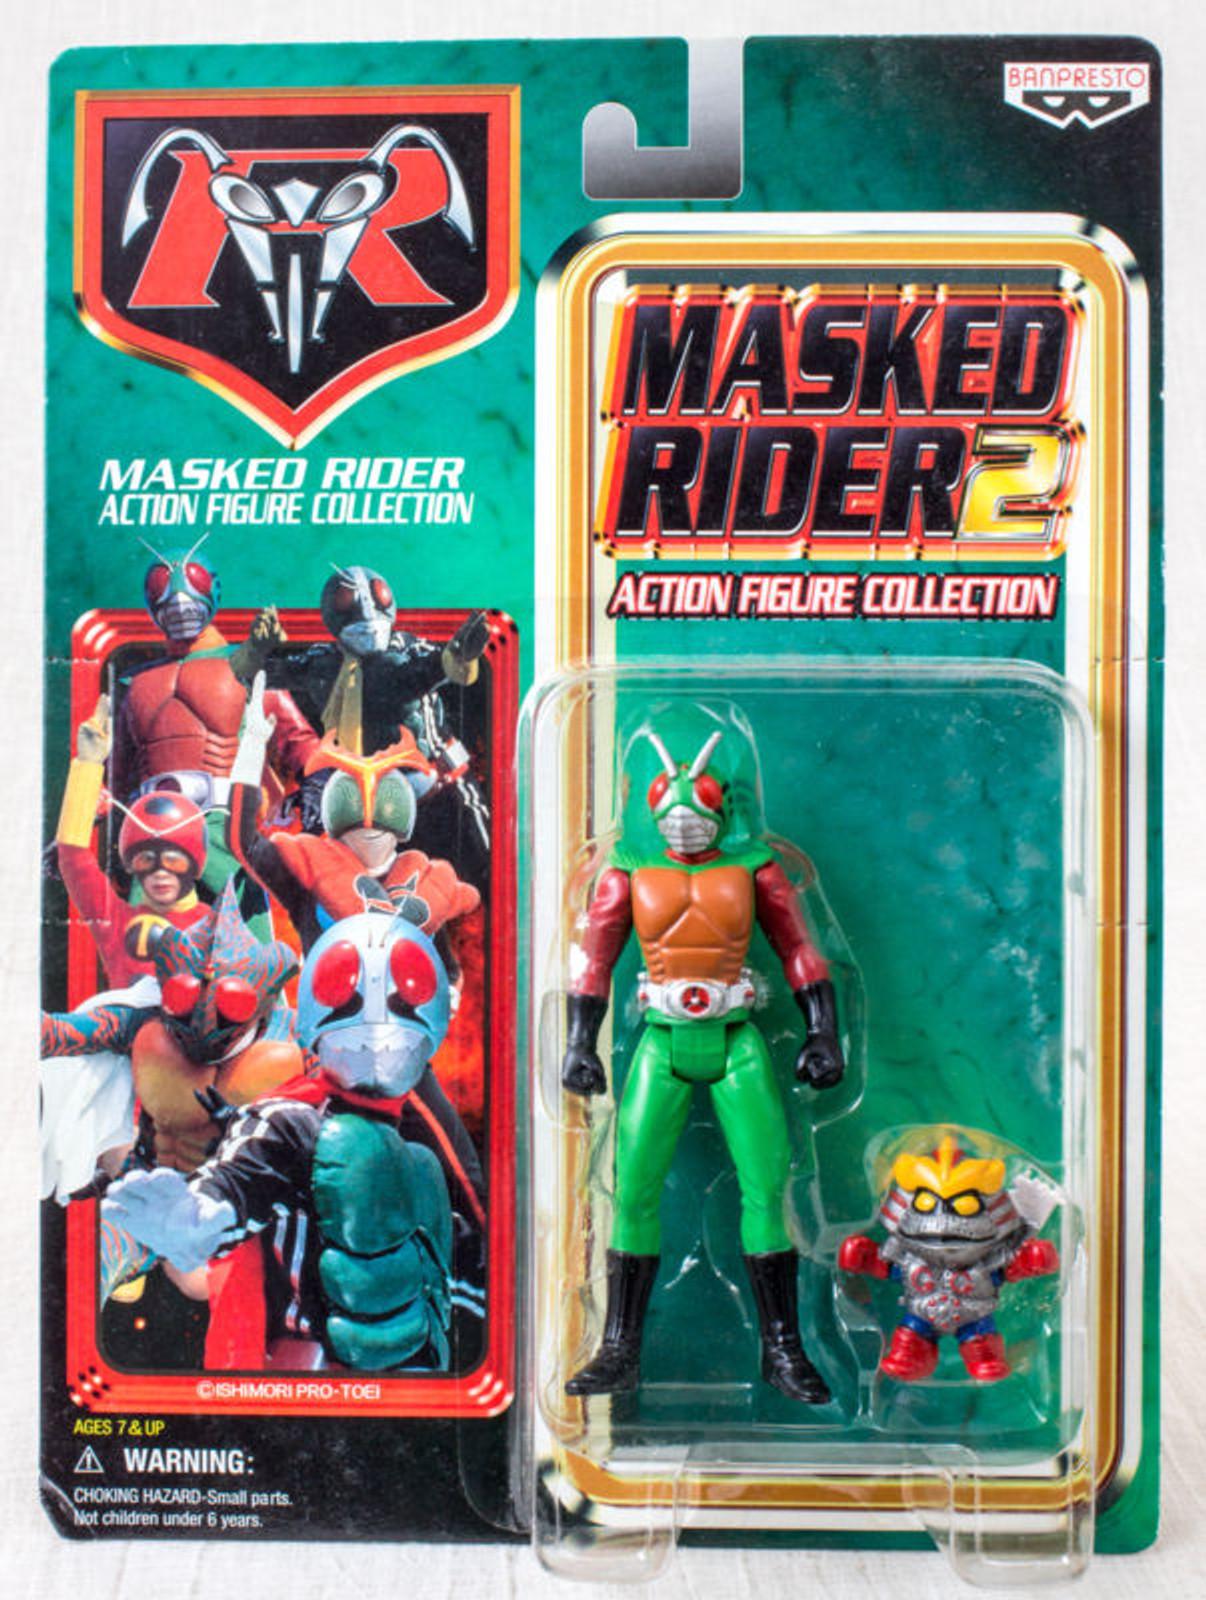 Kamen Rider Sky Rider Masked Rider 2 Action Figure Collection JAPAN TOKUSATSU